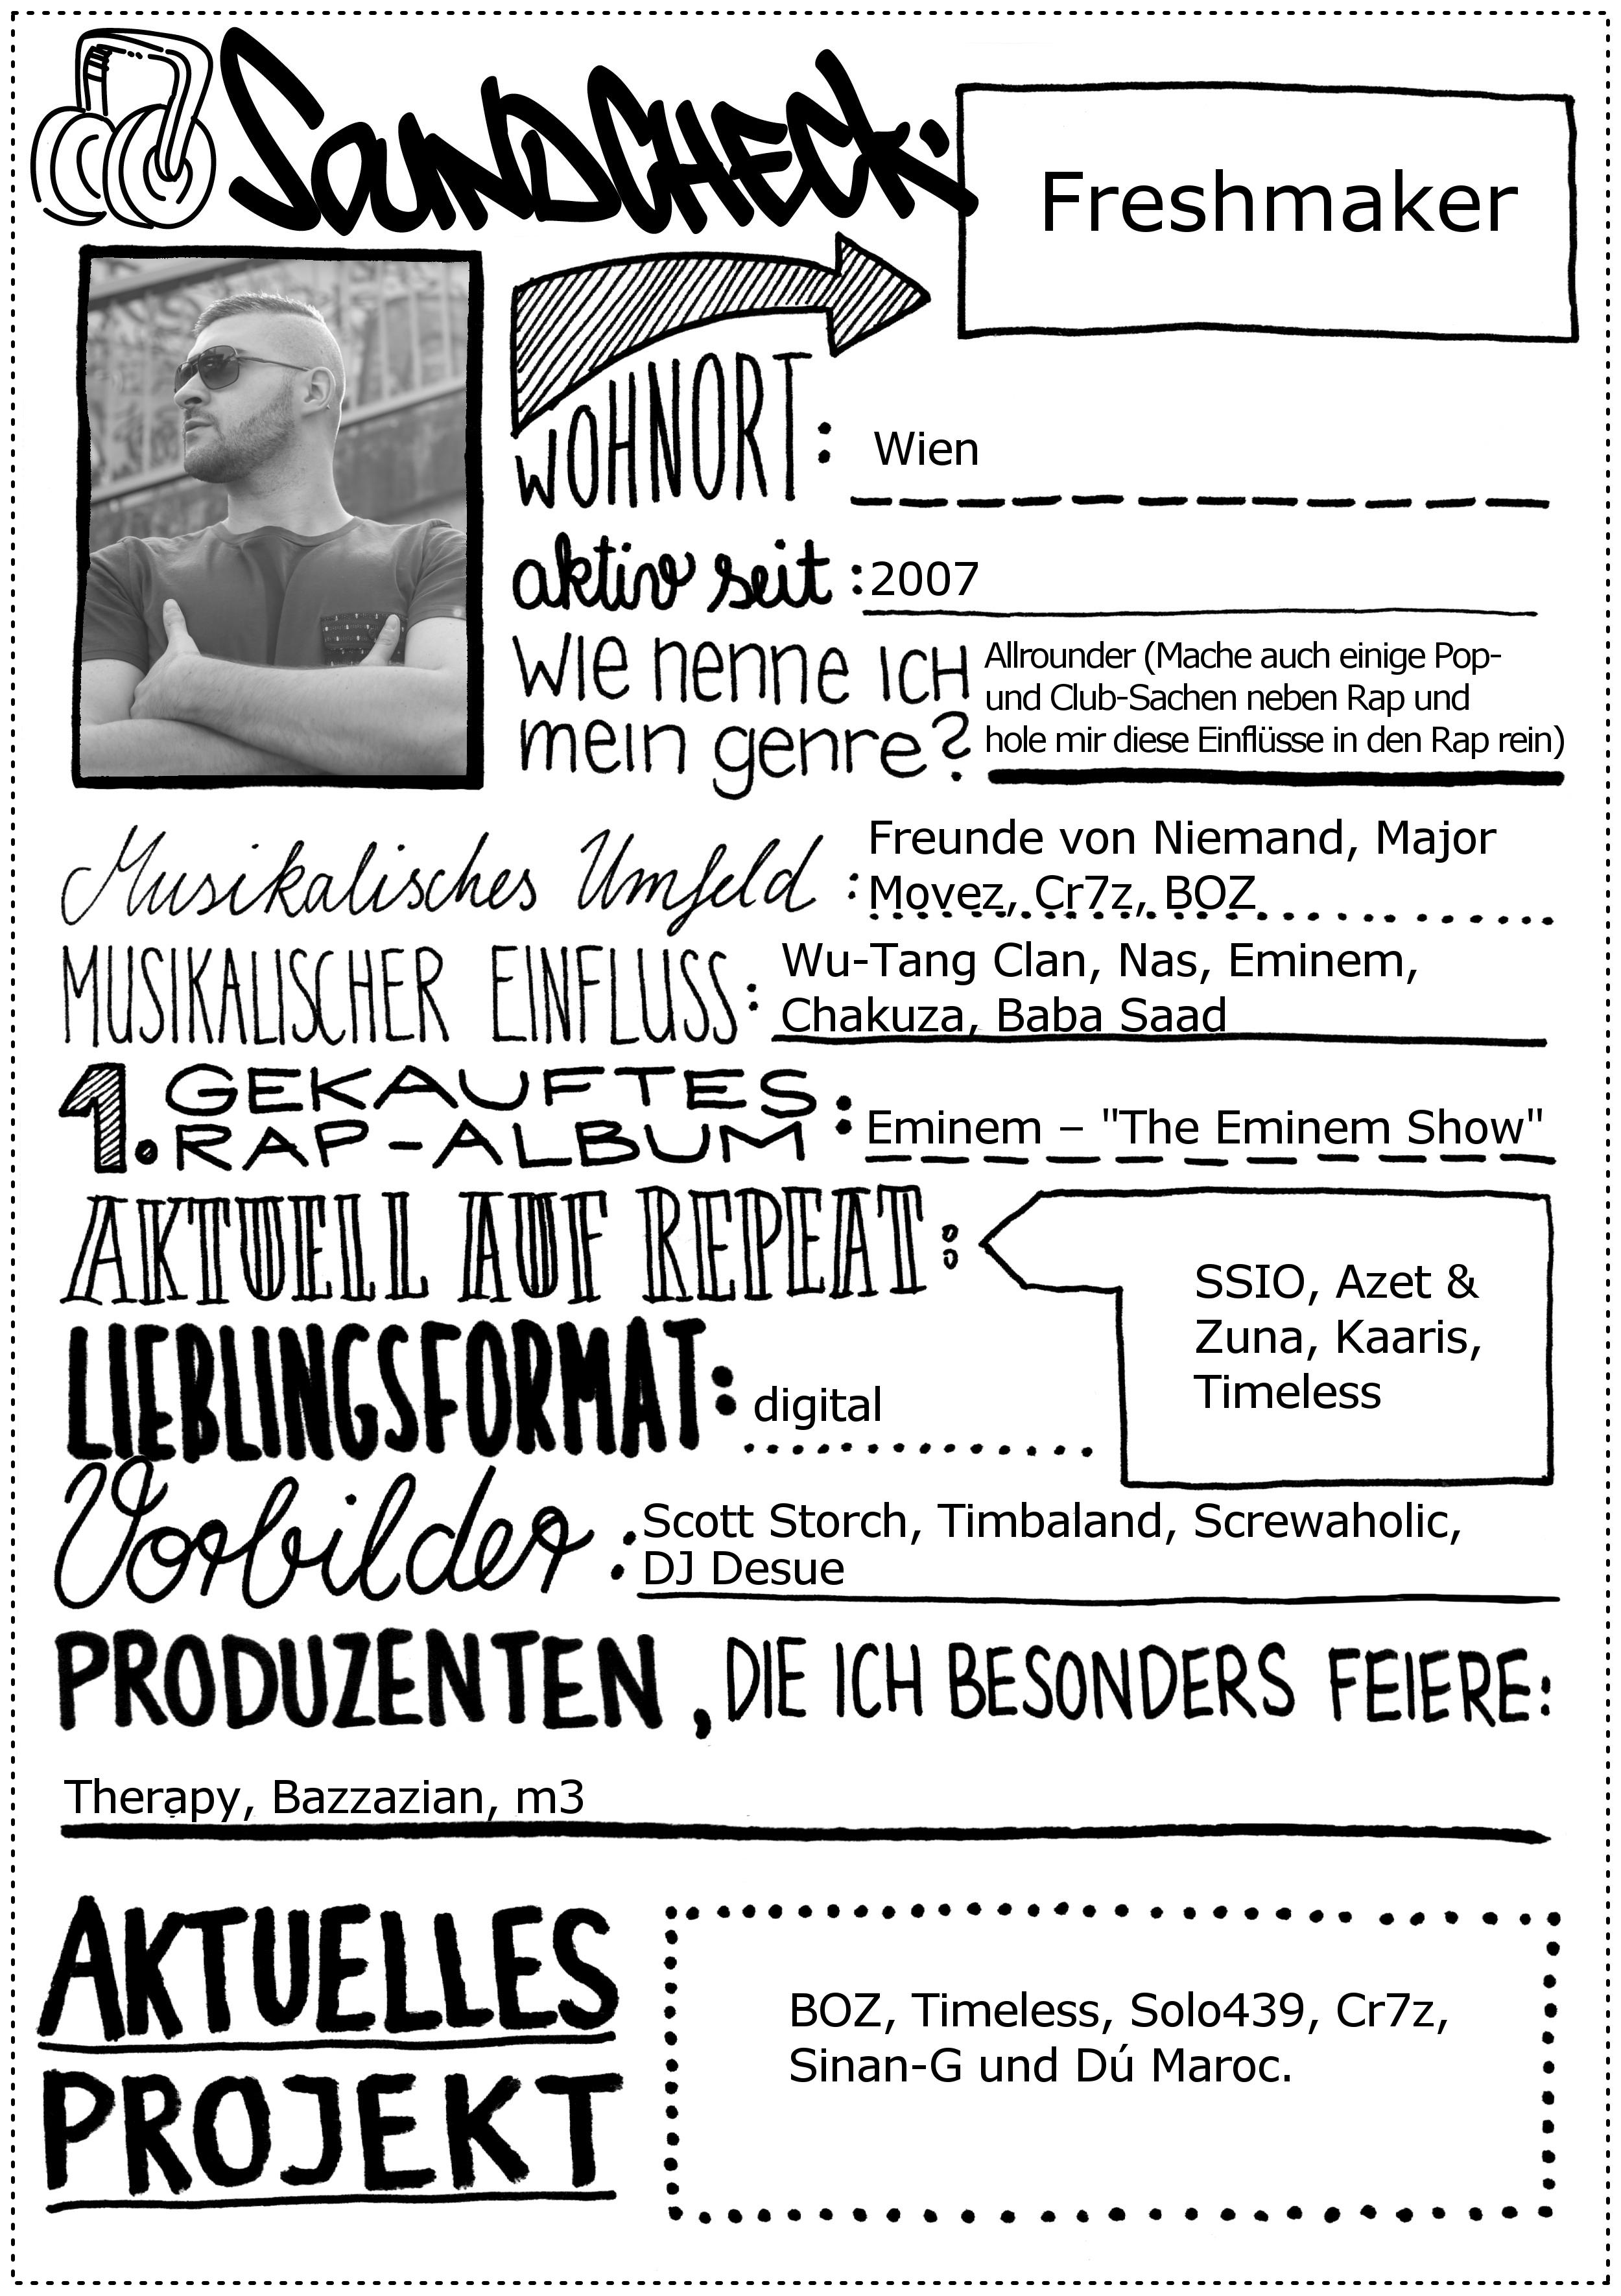 sc_freshmaker_checkliste